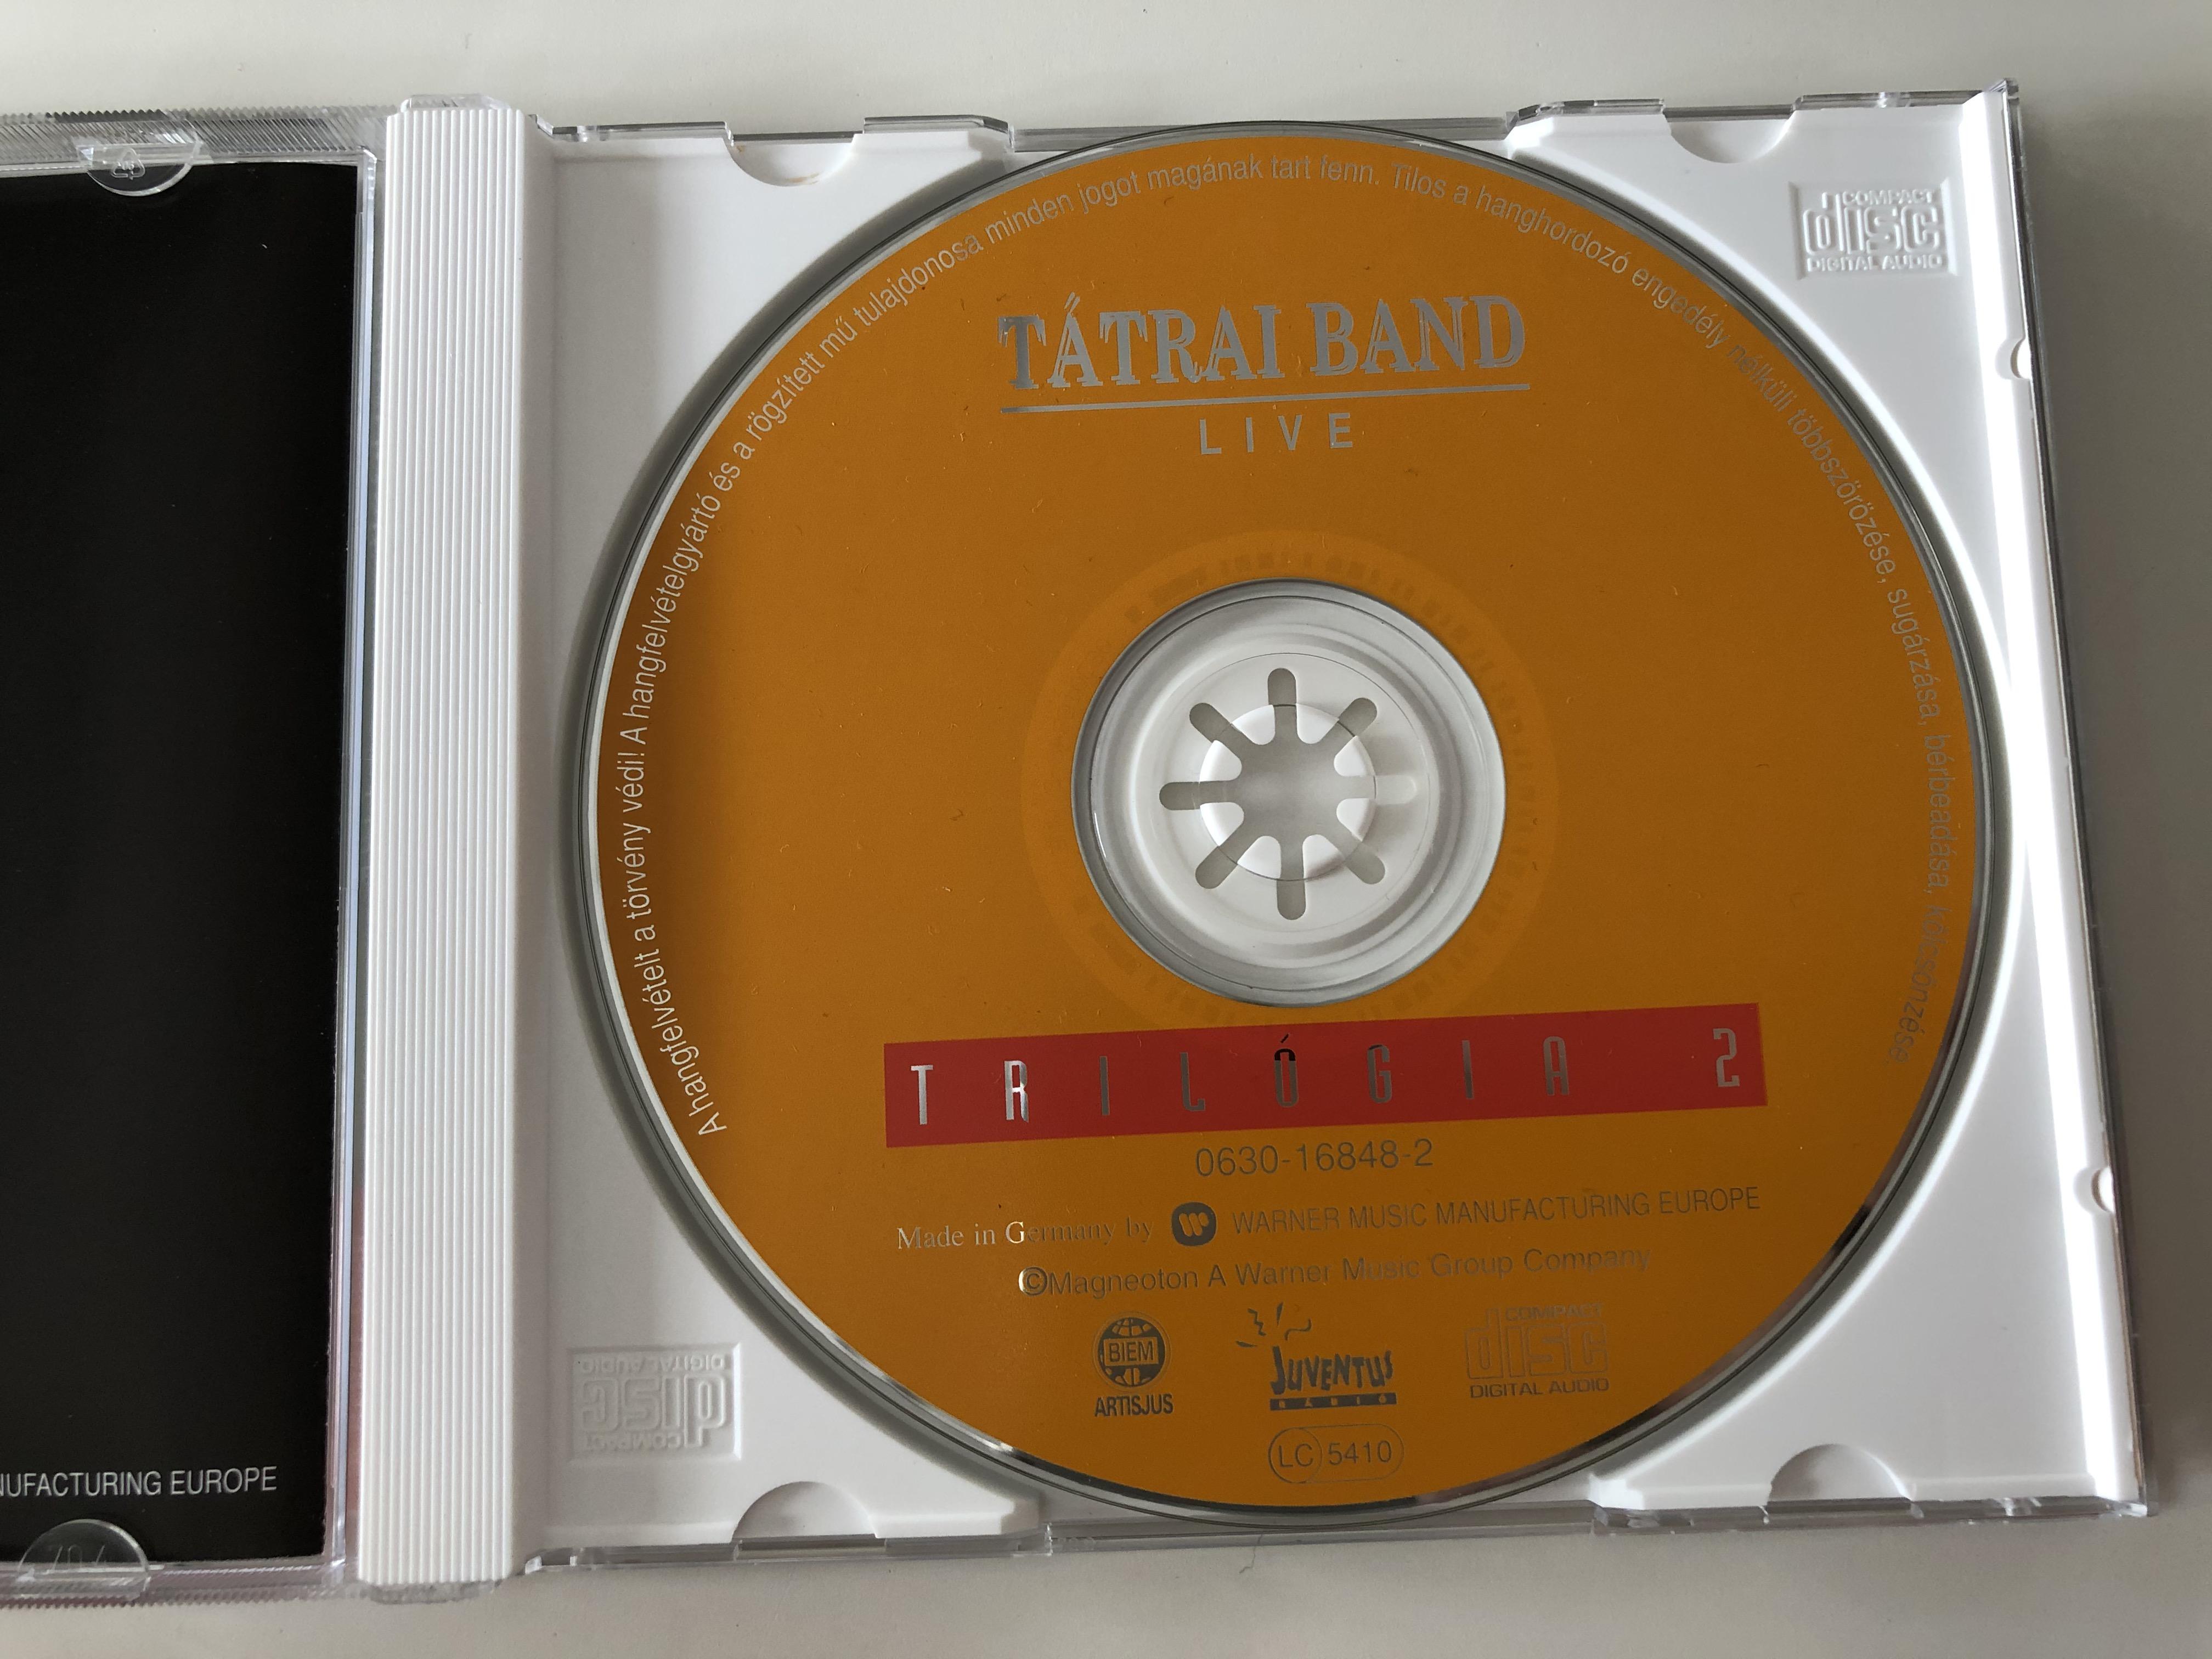 t-trai-band-live-tril-gia-2-magneoton-audio-cd-0630-16848-2-3-.jpg